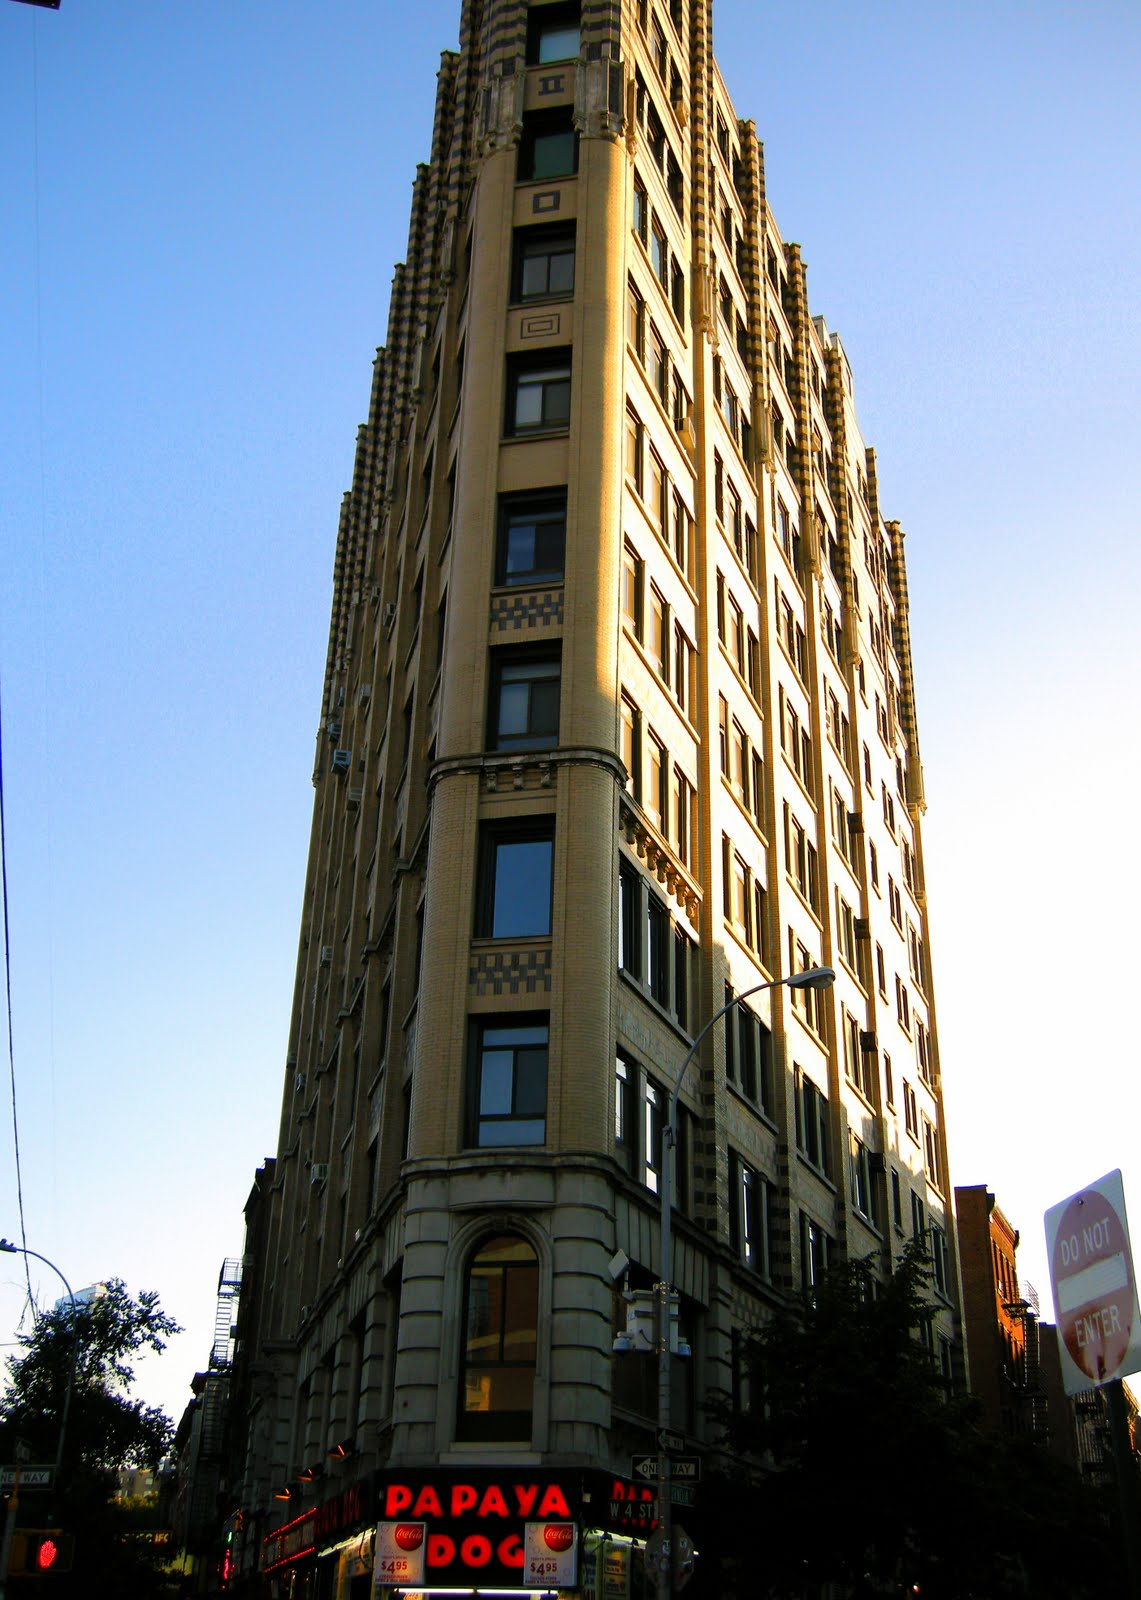 missbinnyc: Triangle shaped building